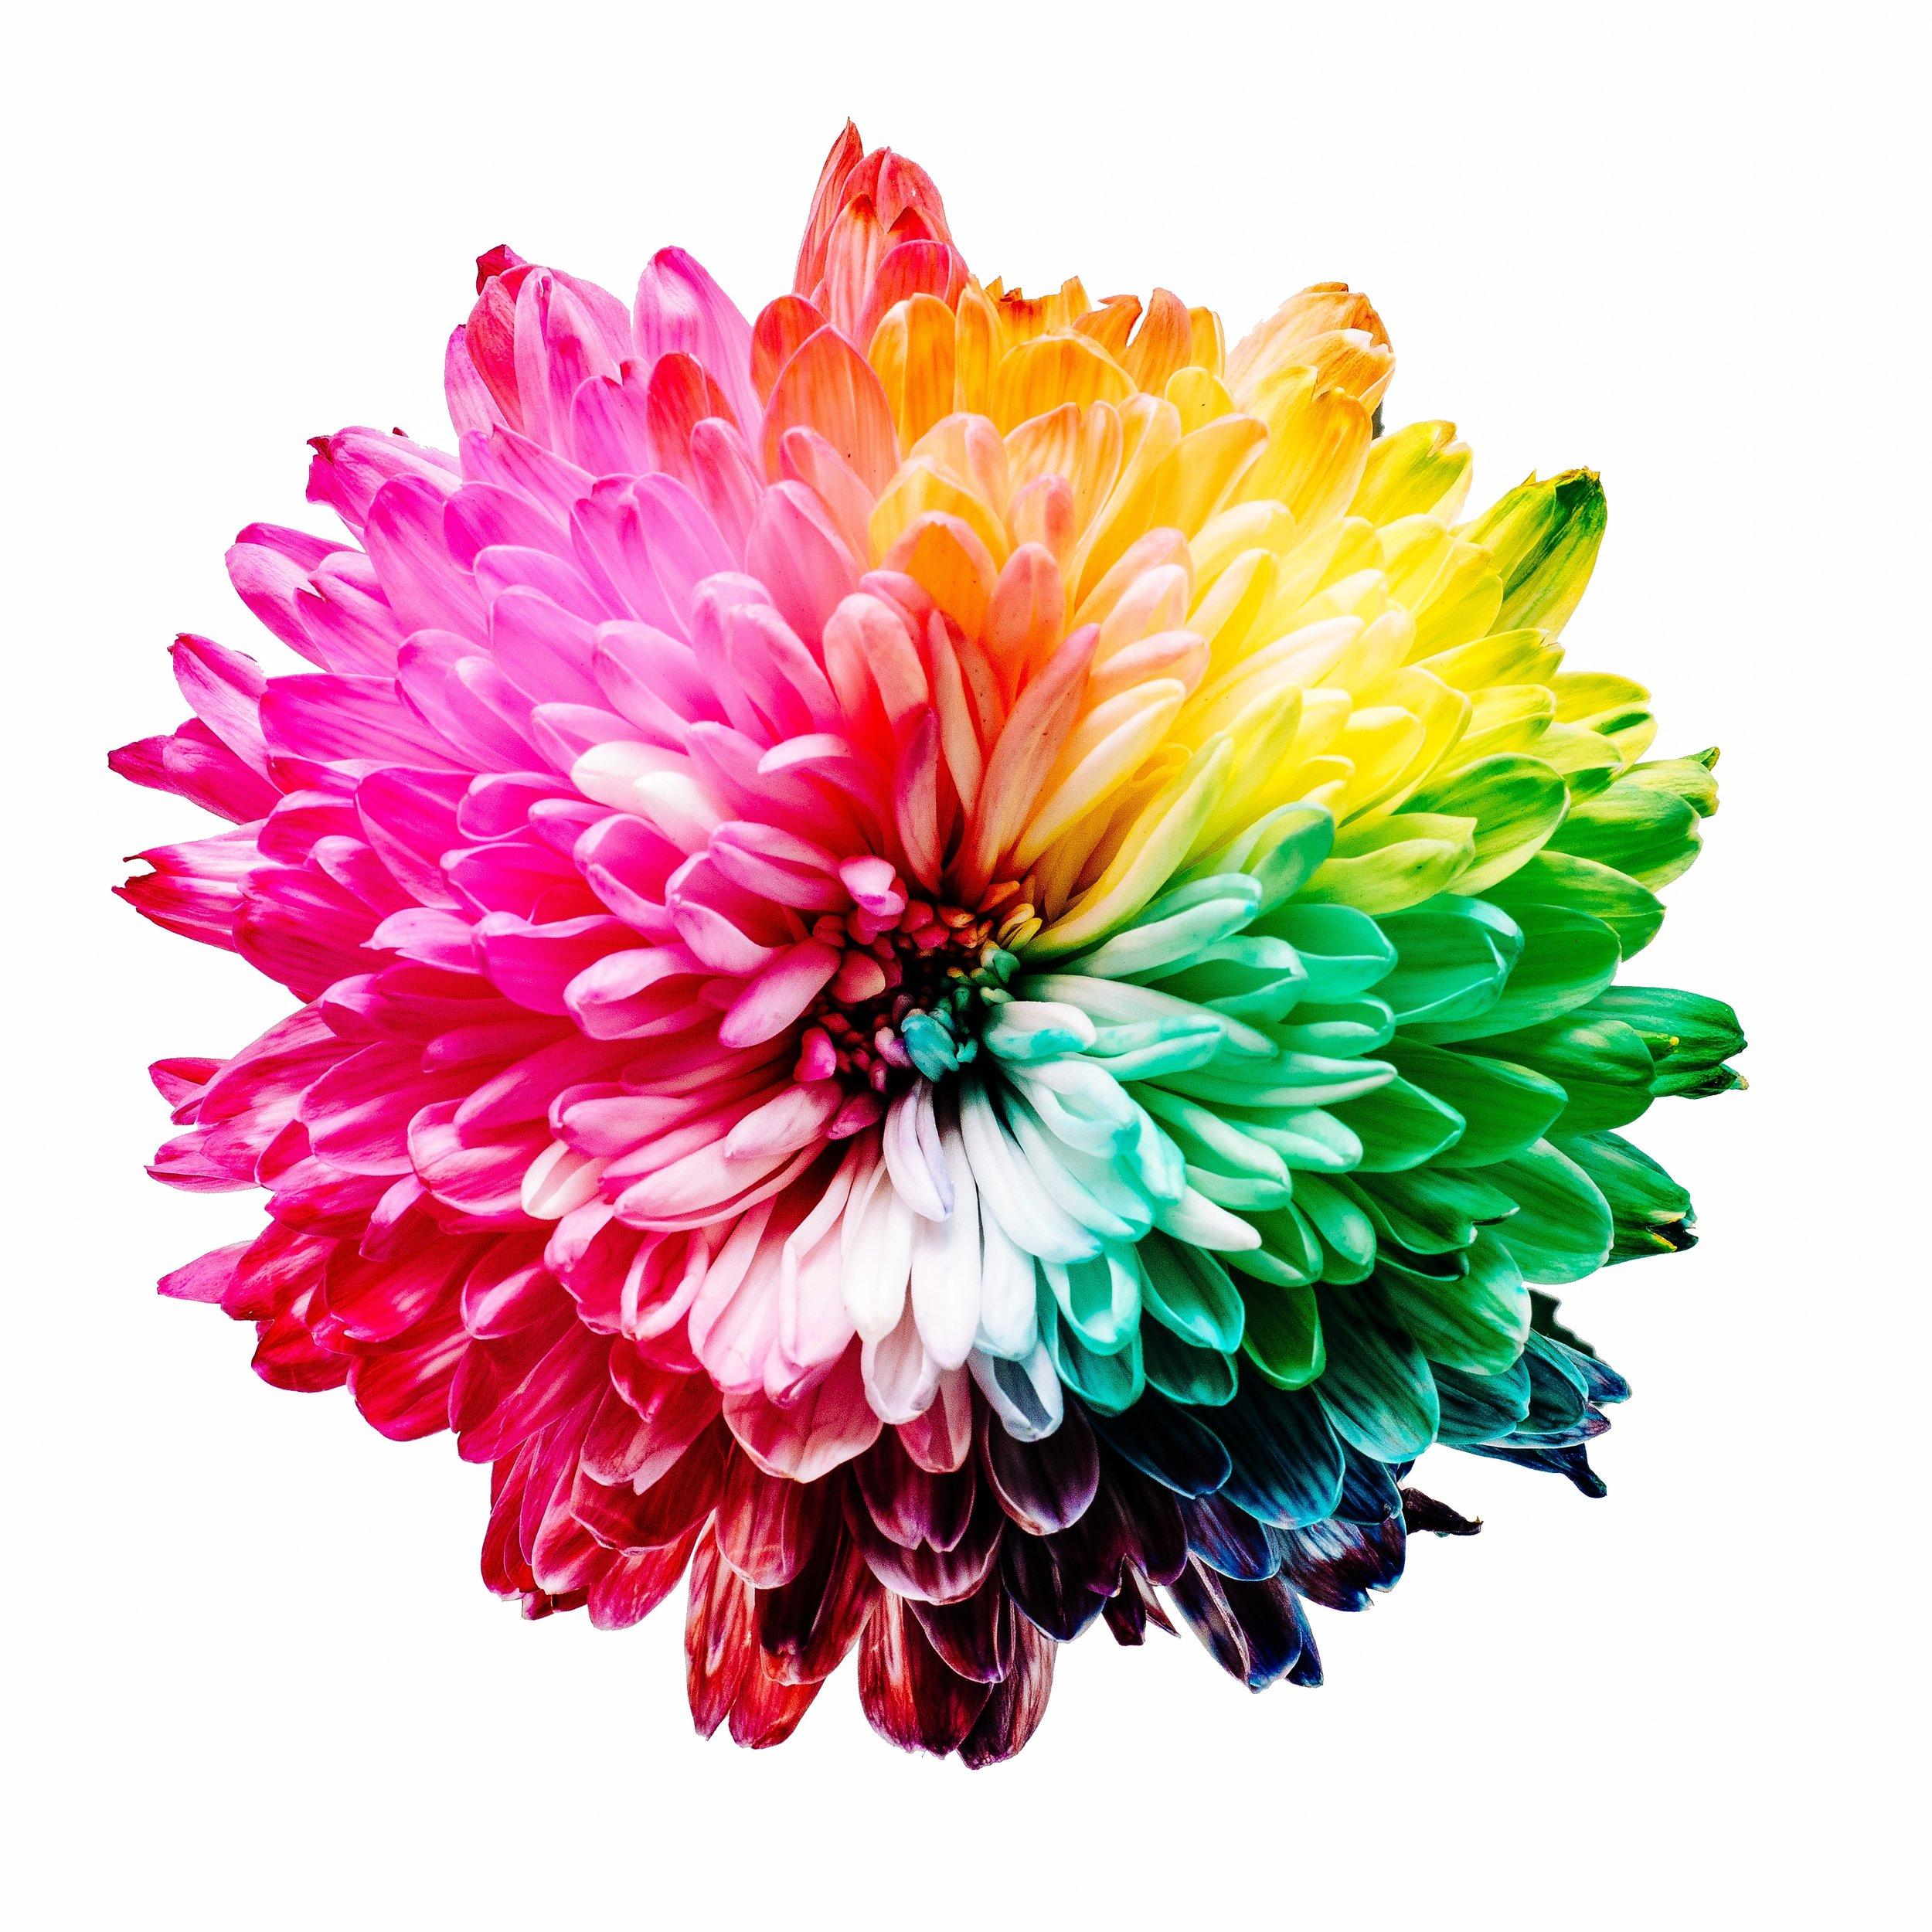 Bisexual & Lesbian Health -